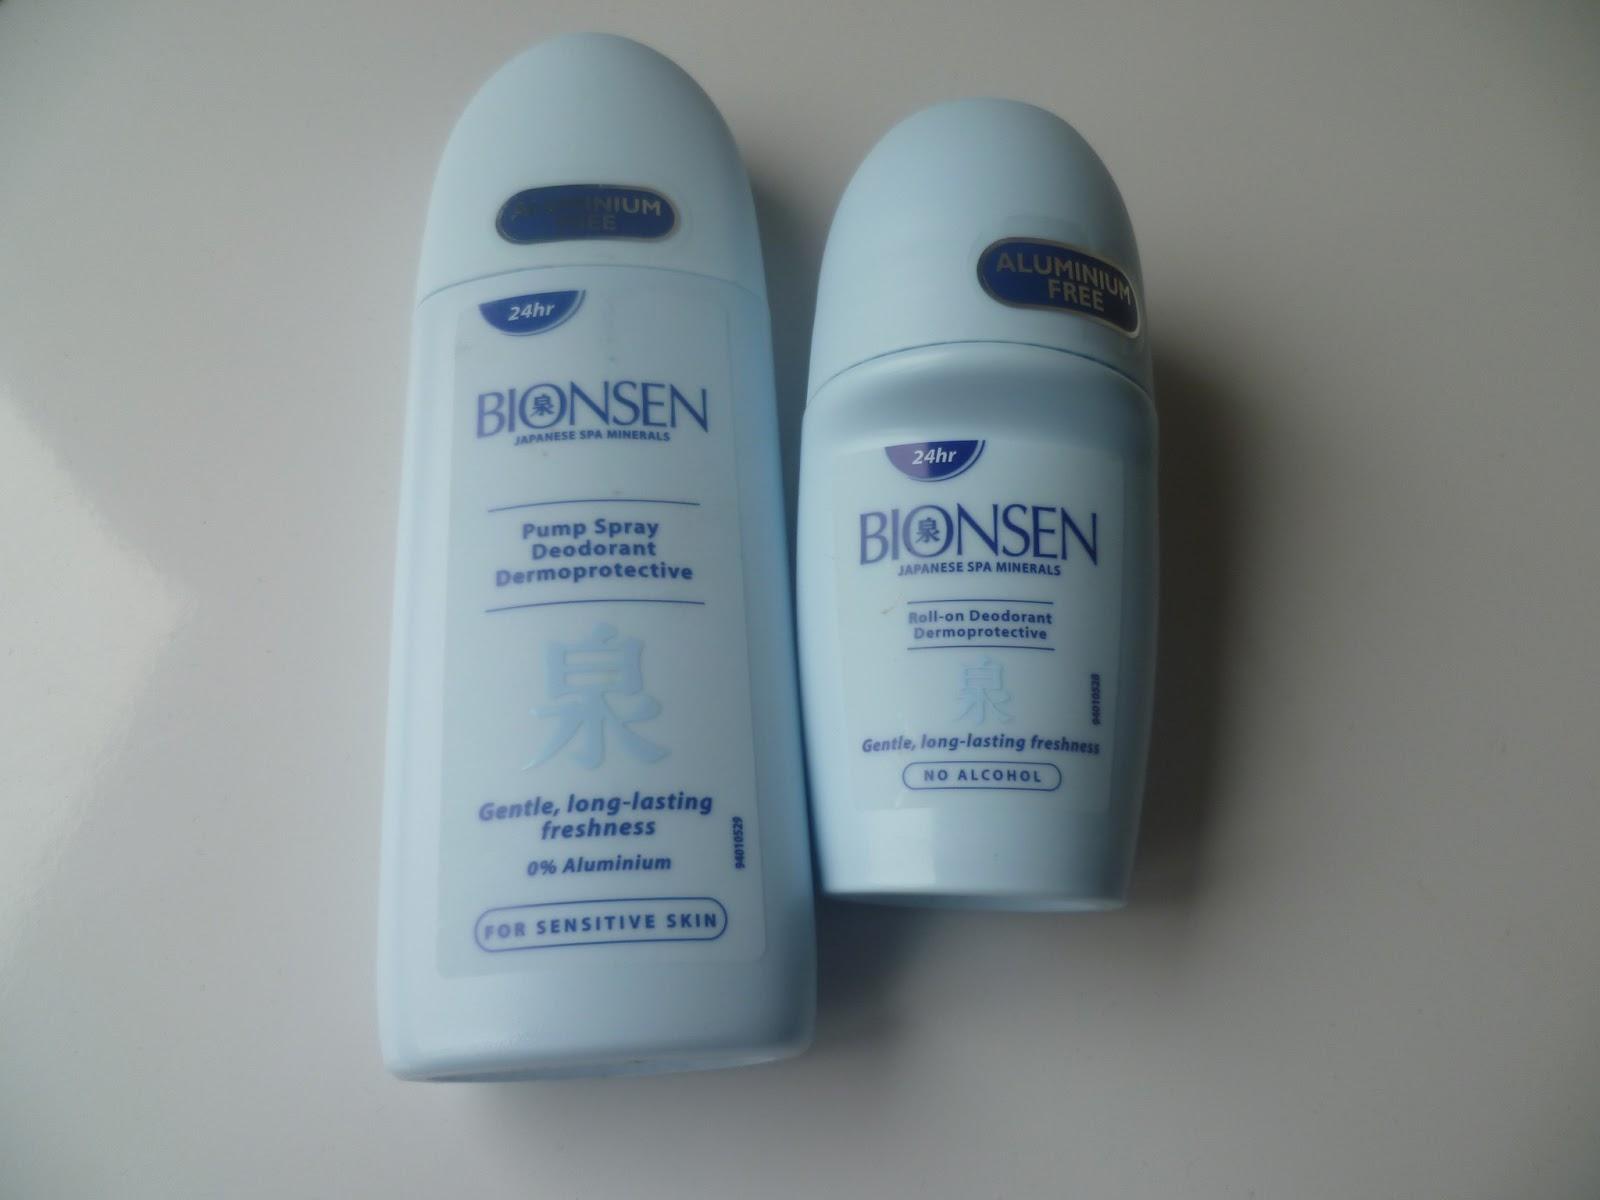 Bionsen Japanese Spa Minerals Pump Spray & Roll On Deodorant - Futures